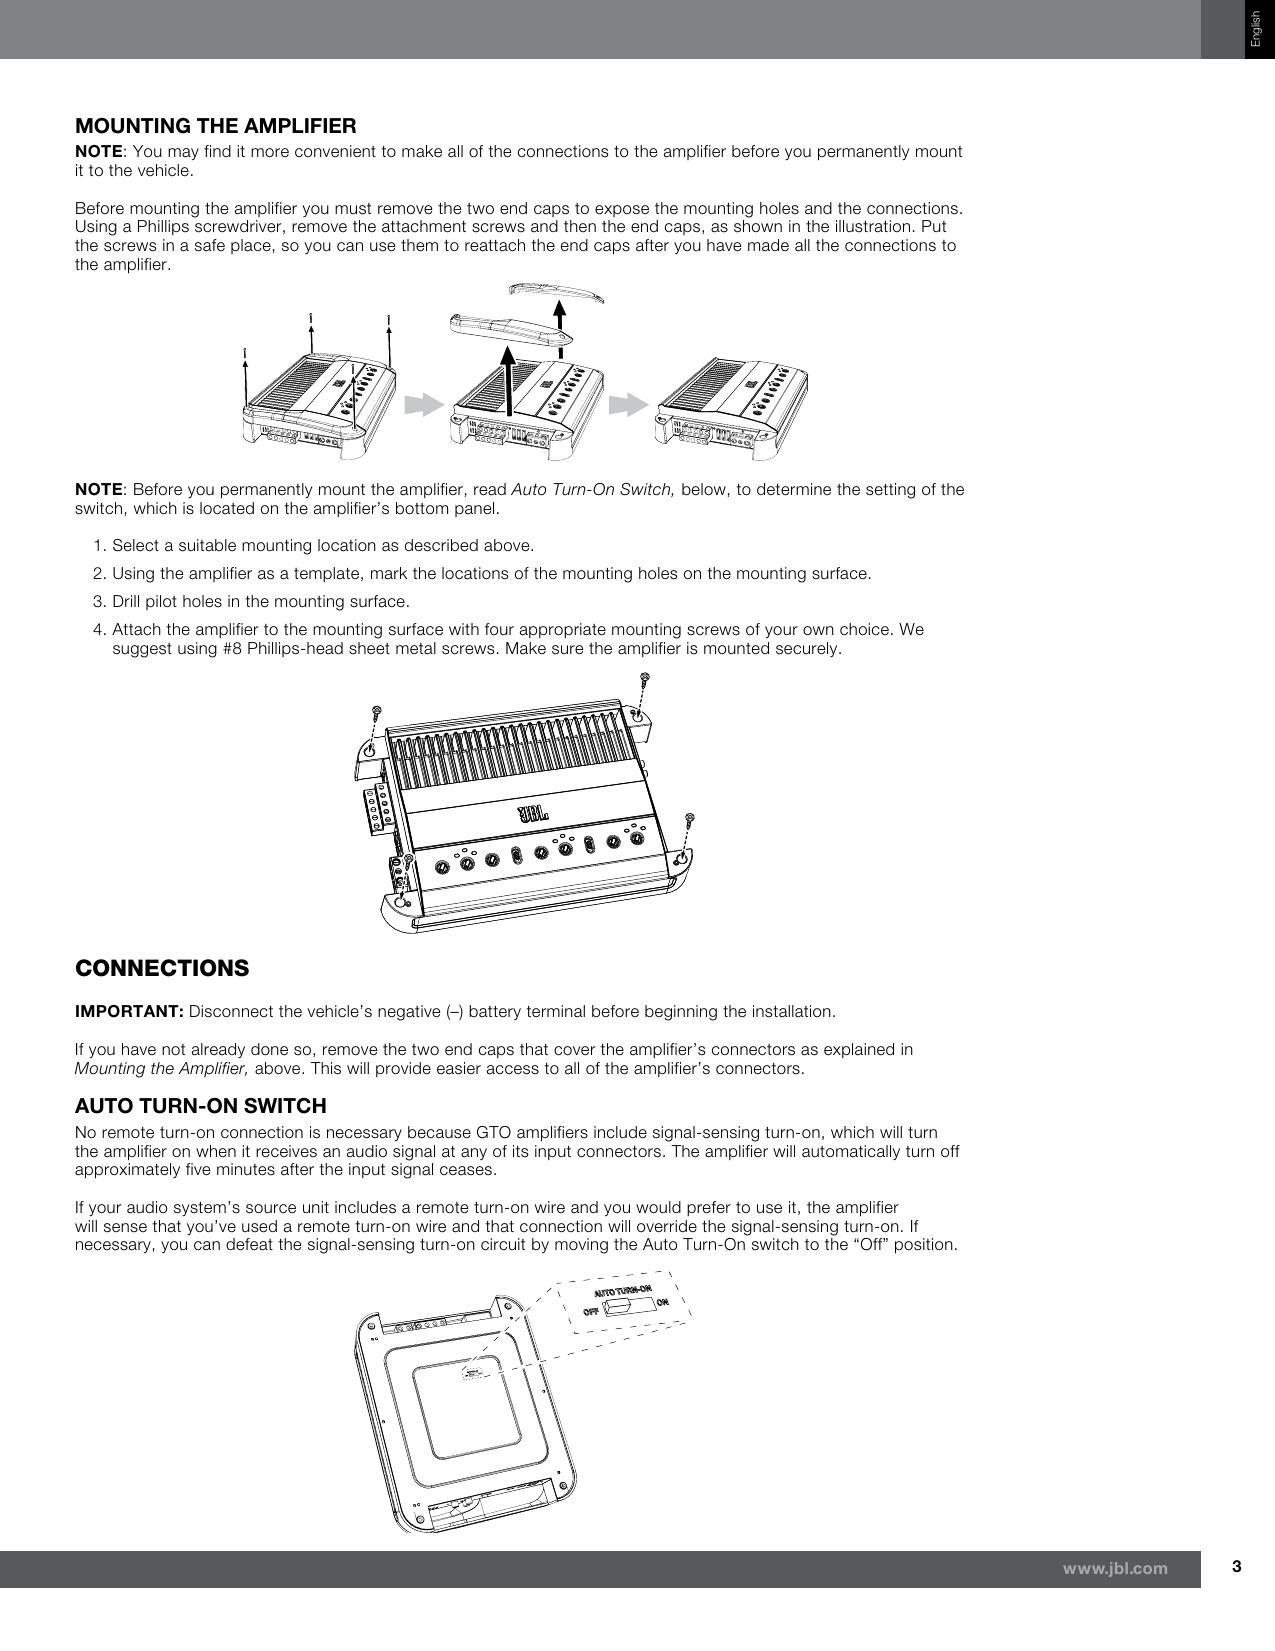 page 3 of 11 - jbl jbl-gto-1001ez-users-manual-